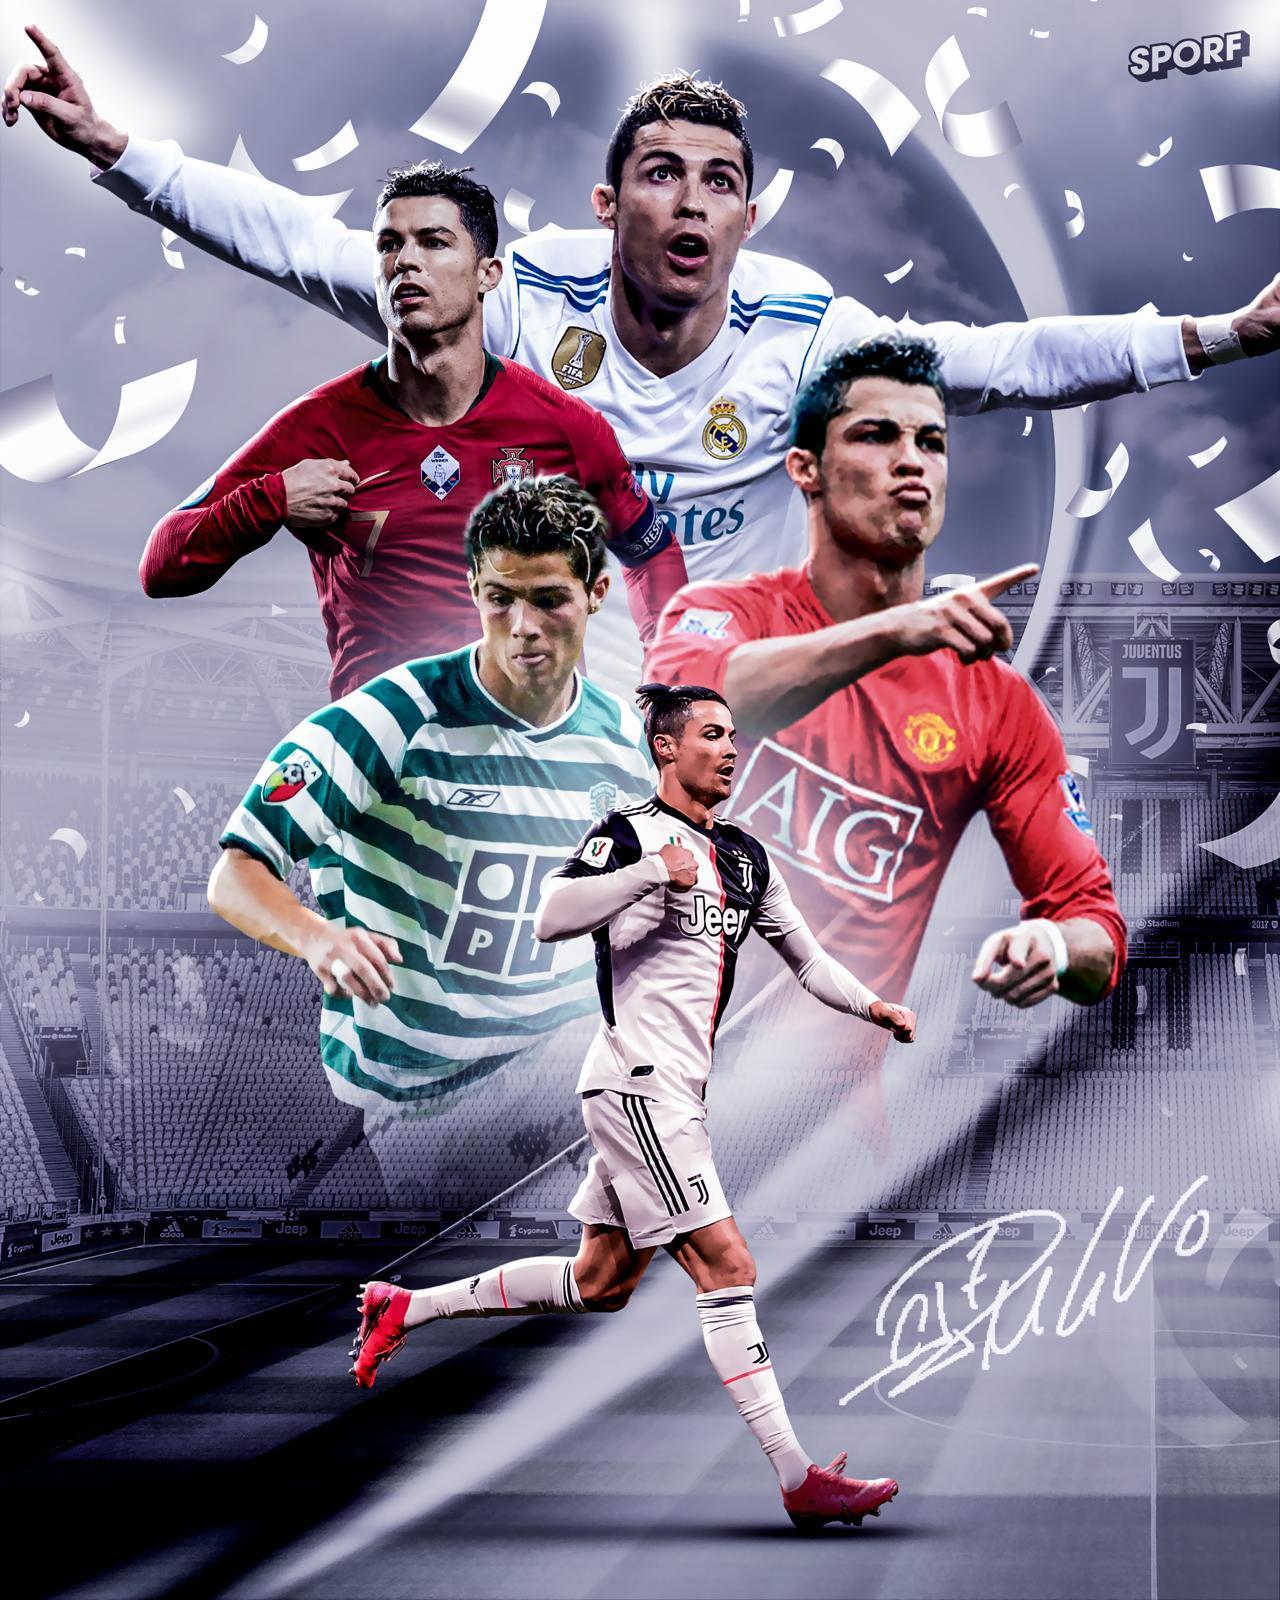 Cristiano Ronaldo HD 2020 Wallpapers - Wallpaper Cave